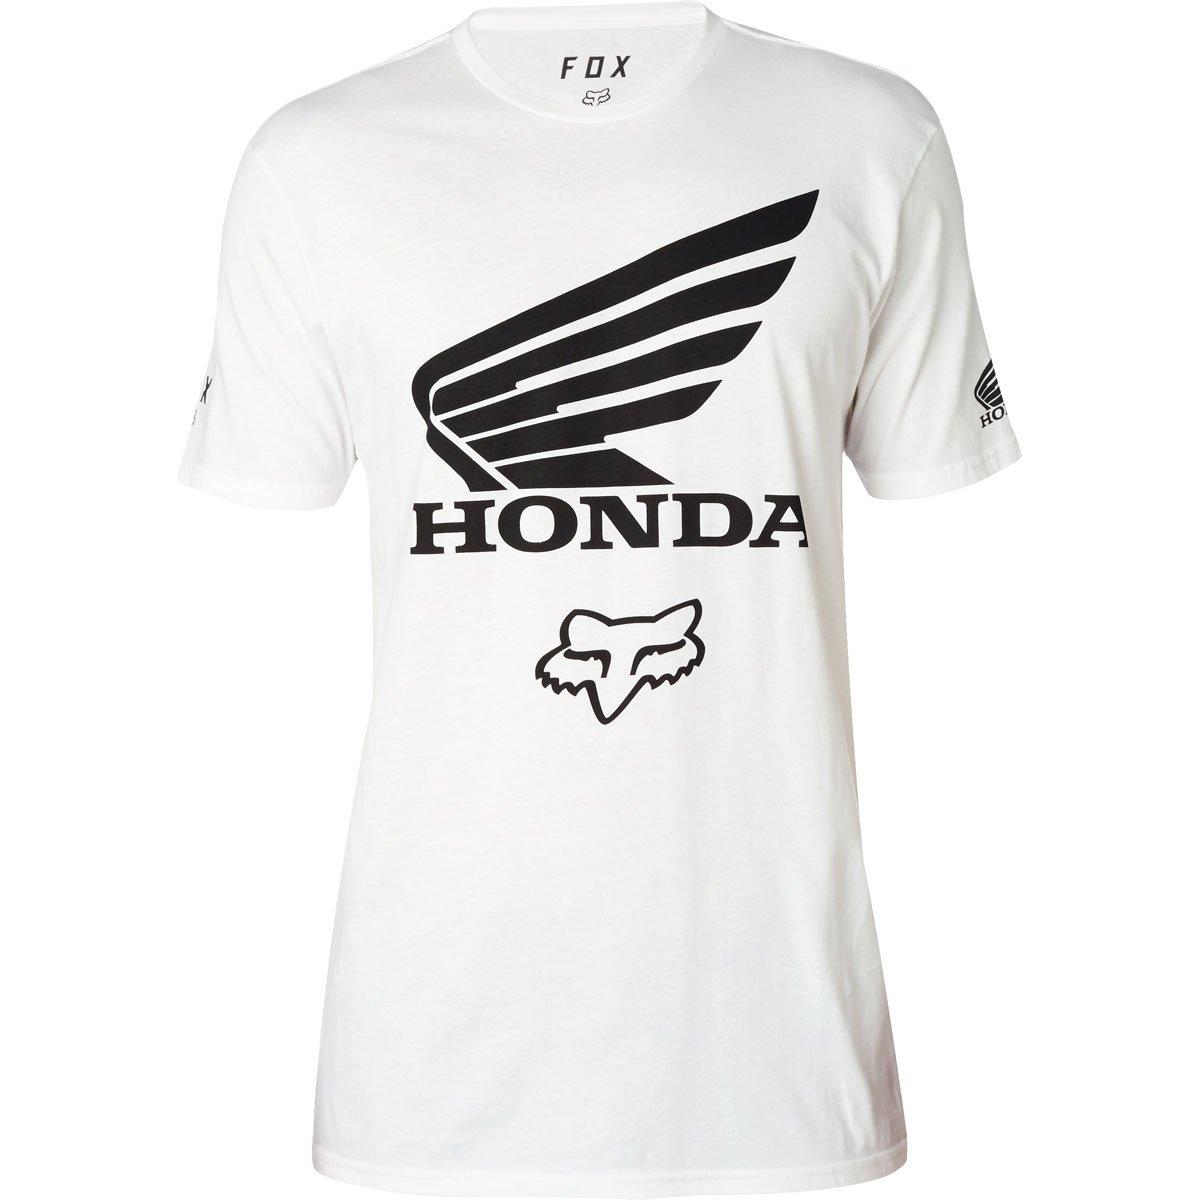 8fa66b4038c Fox Racing 2019 Honda Premium T-Shirt - DirtRider   MX   Off-Road ...